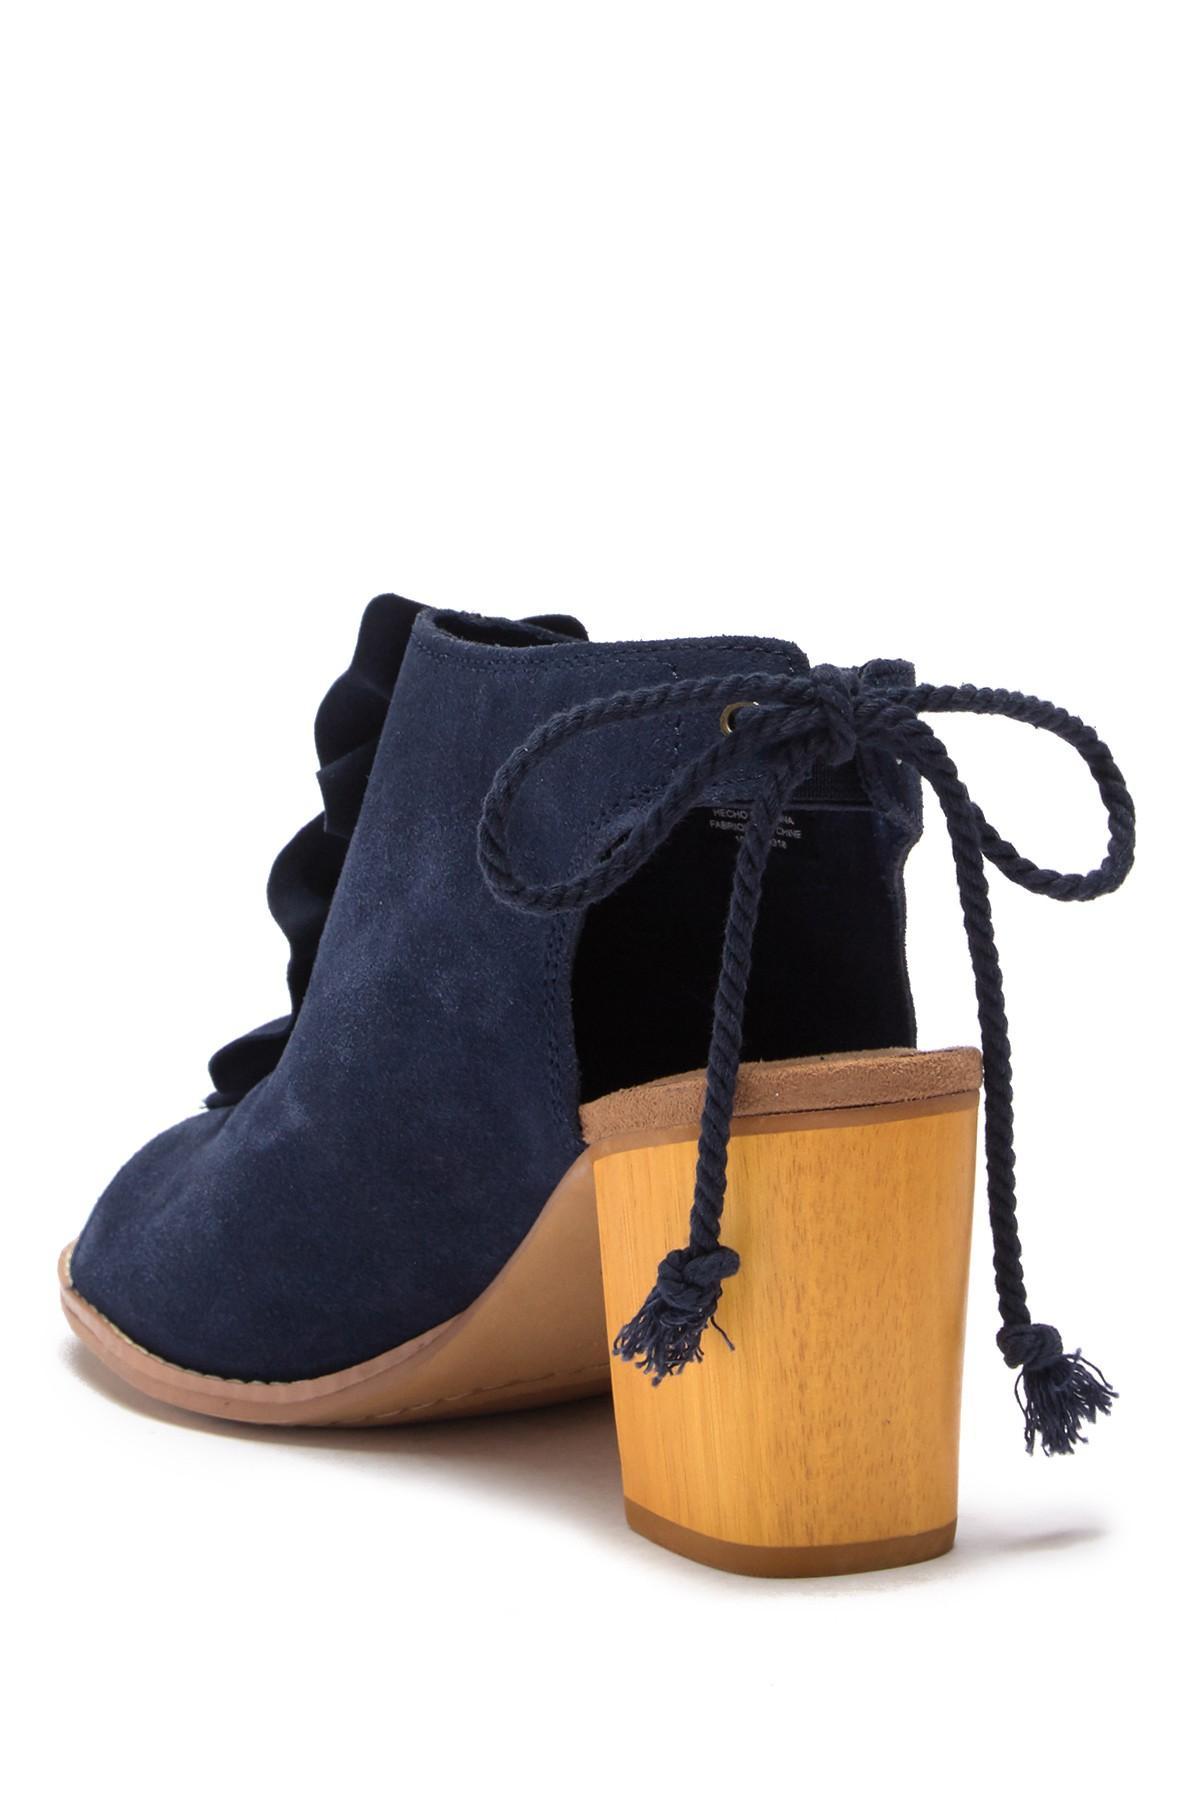 35c1cc028af TOMS - Blue Elba Peep Toe Block Heel Bootie - Lyst. View fullscreen